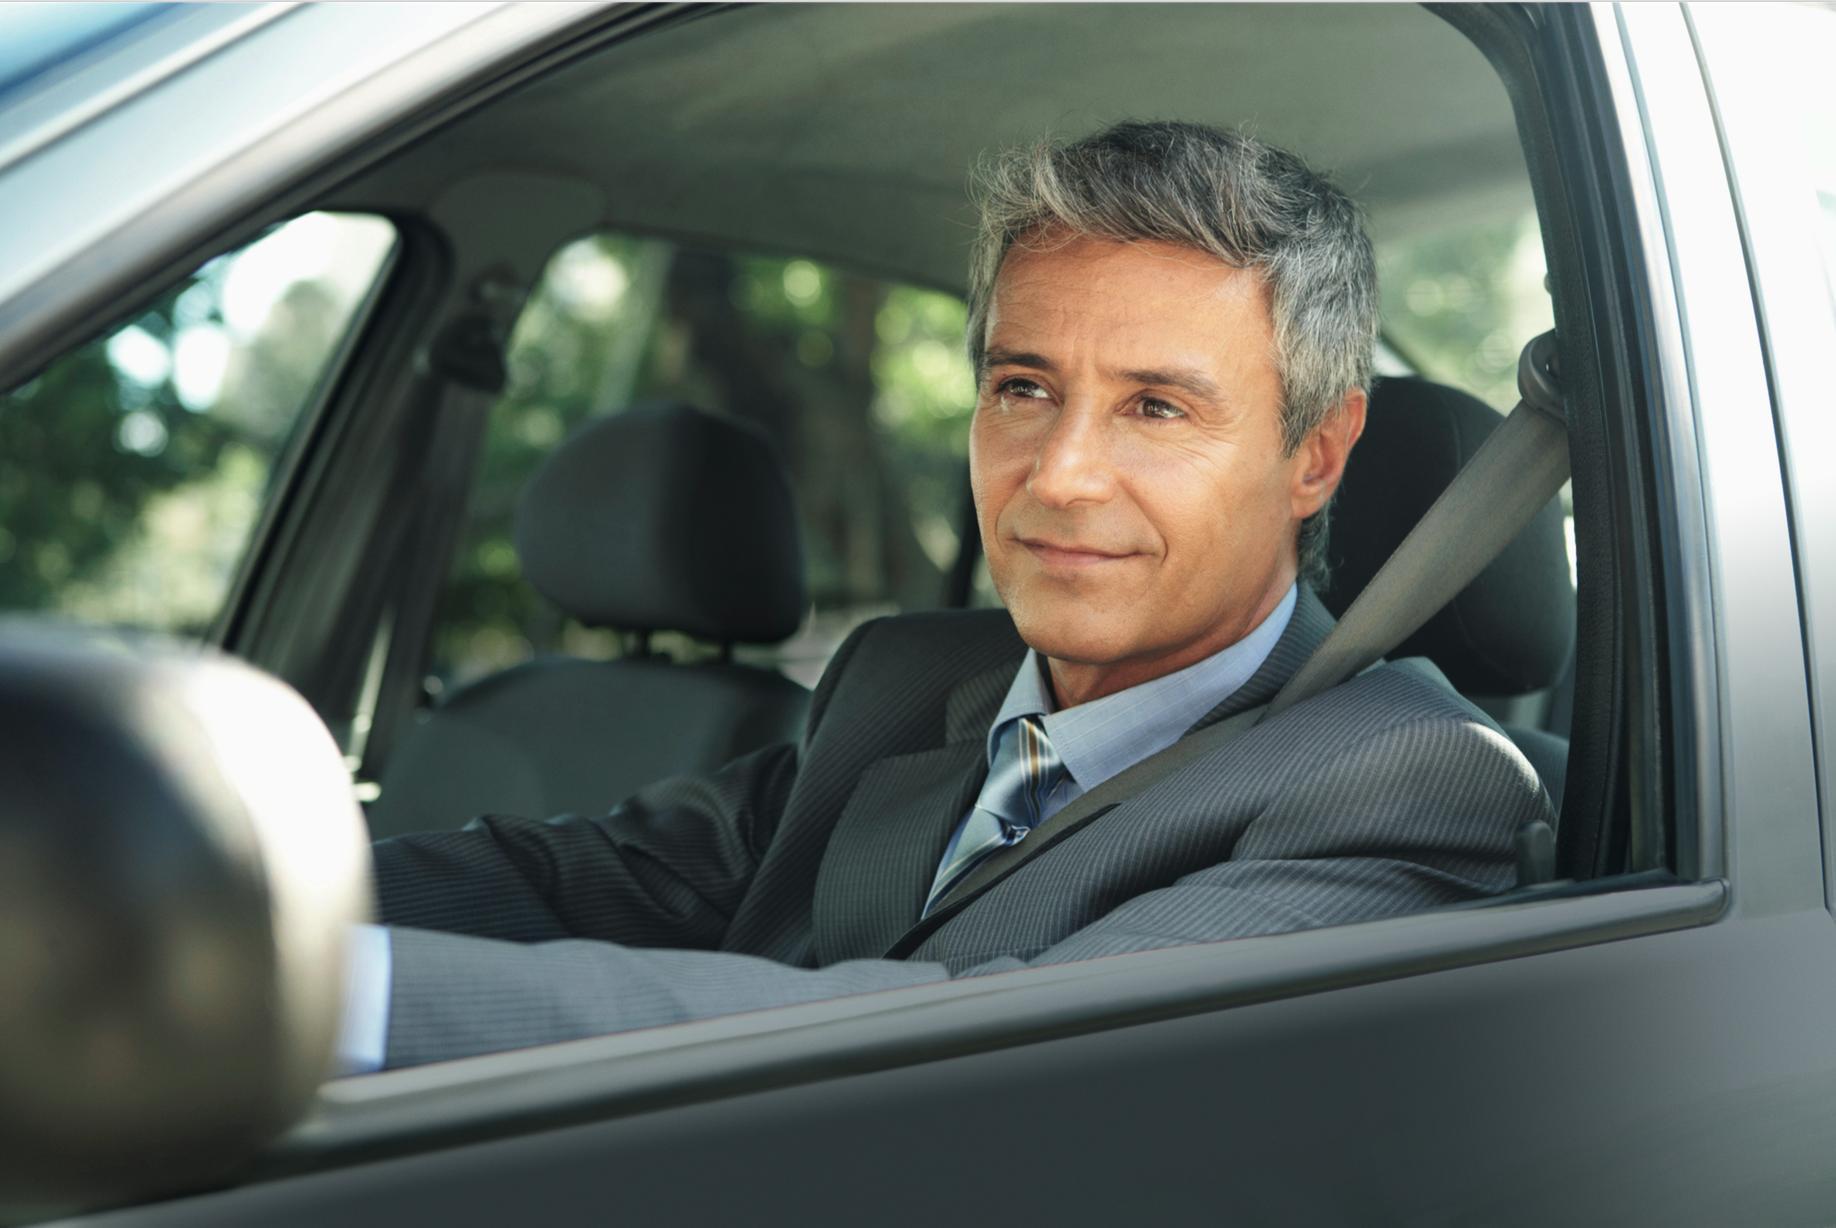 Advtraining It Europcar Entra Su Mercato Italiano Medio Termine